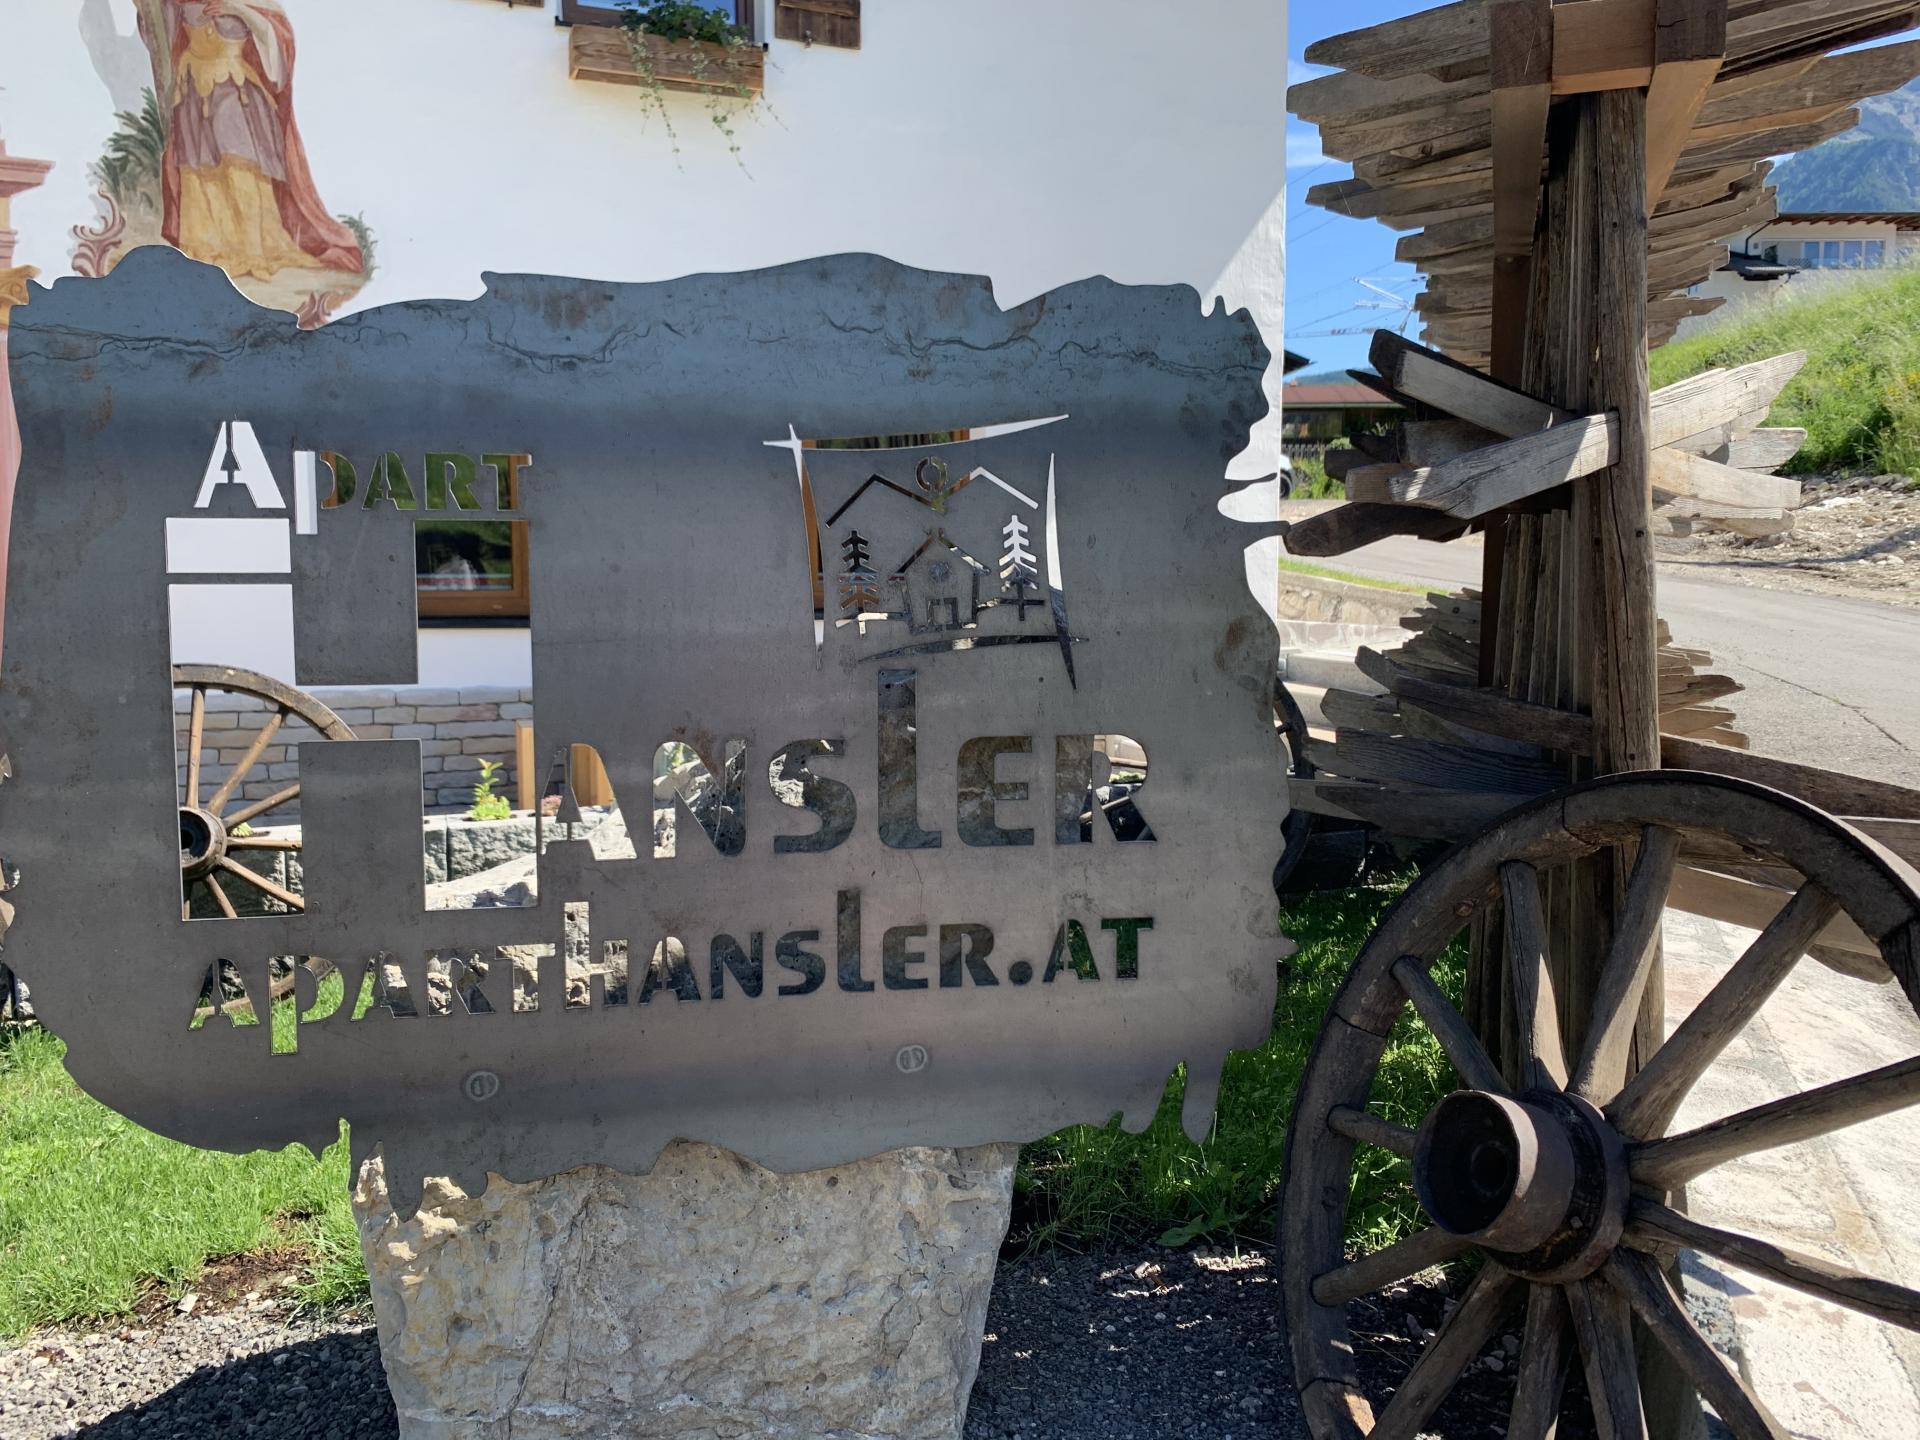 Apart Chalet Hansler #Willkommen#Bildergalerie